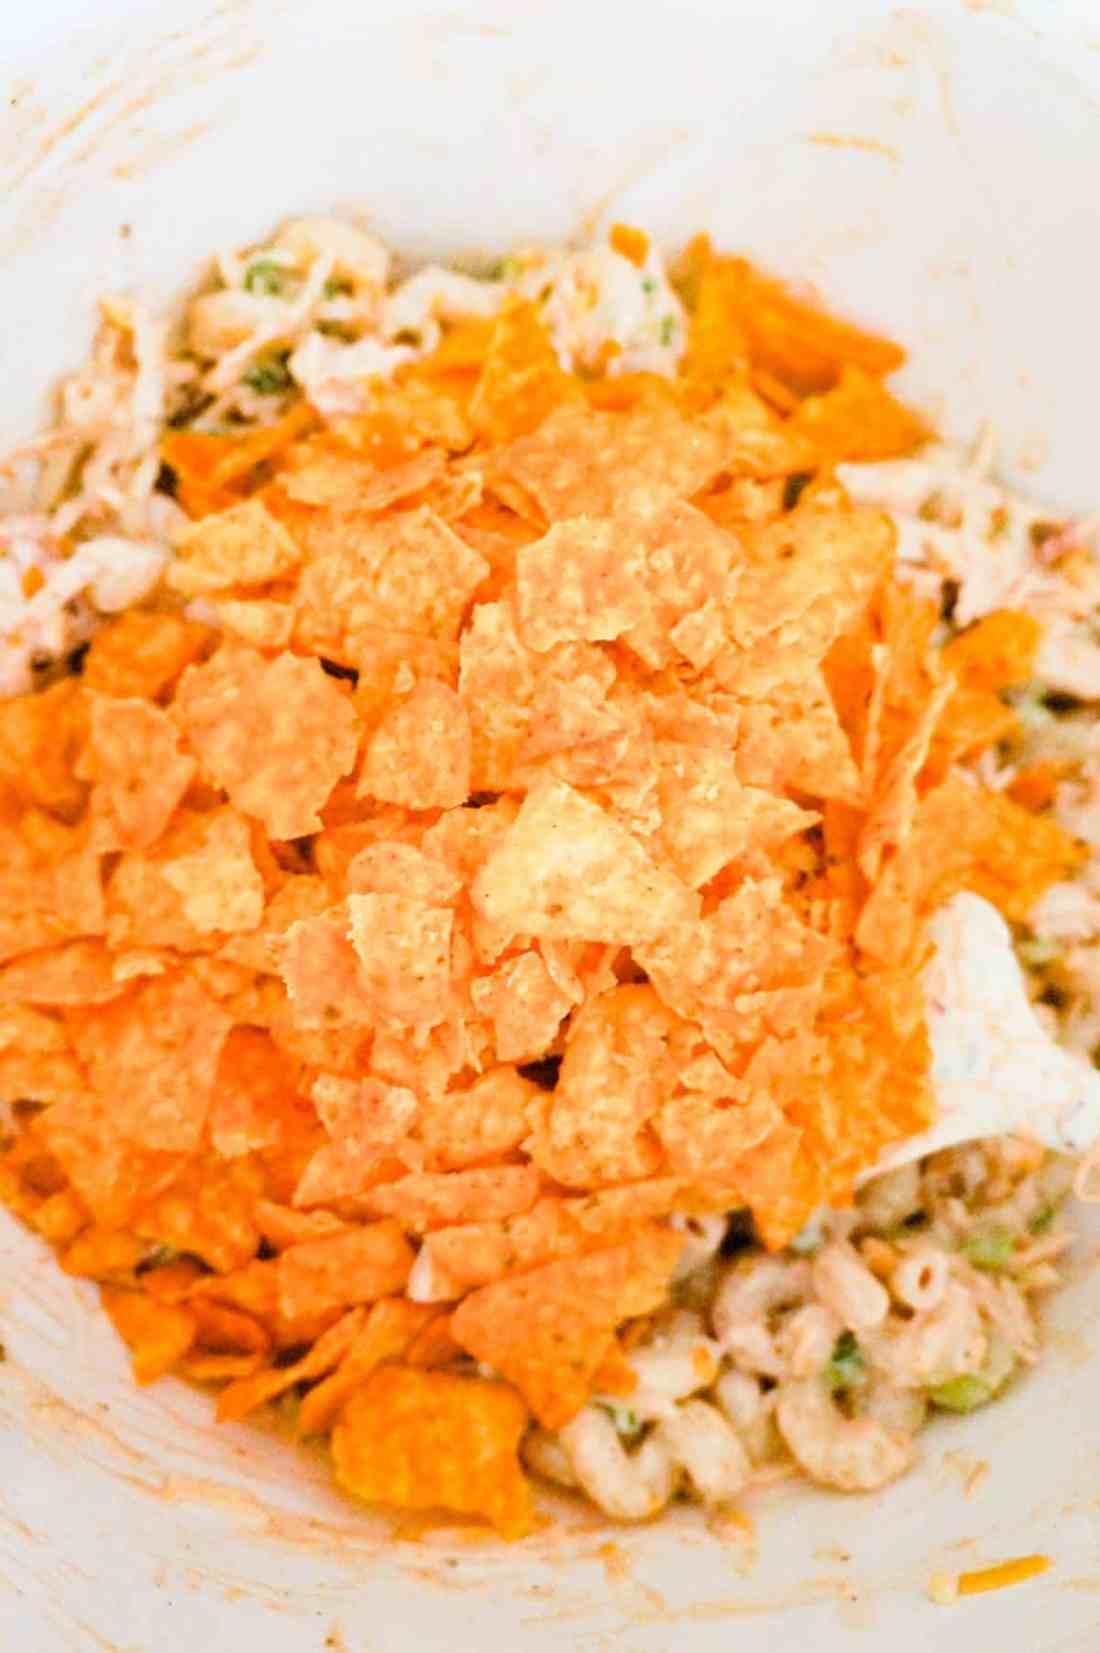 crumbled Doritos on top of pasta salad in a mixing bowl